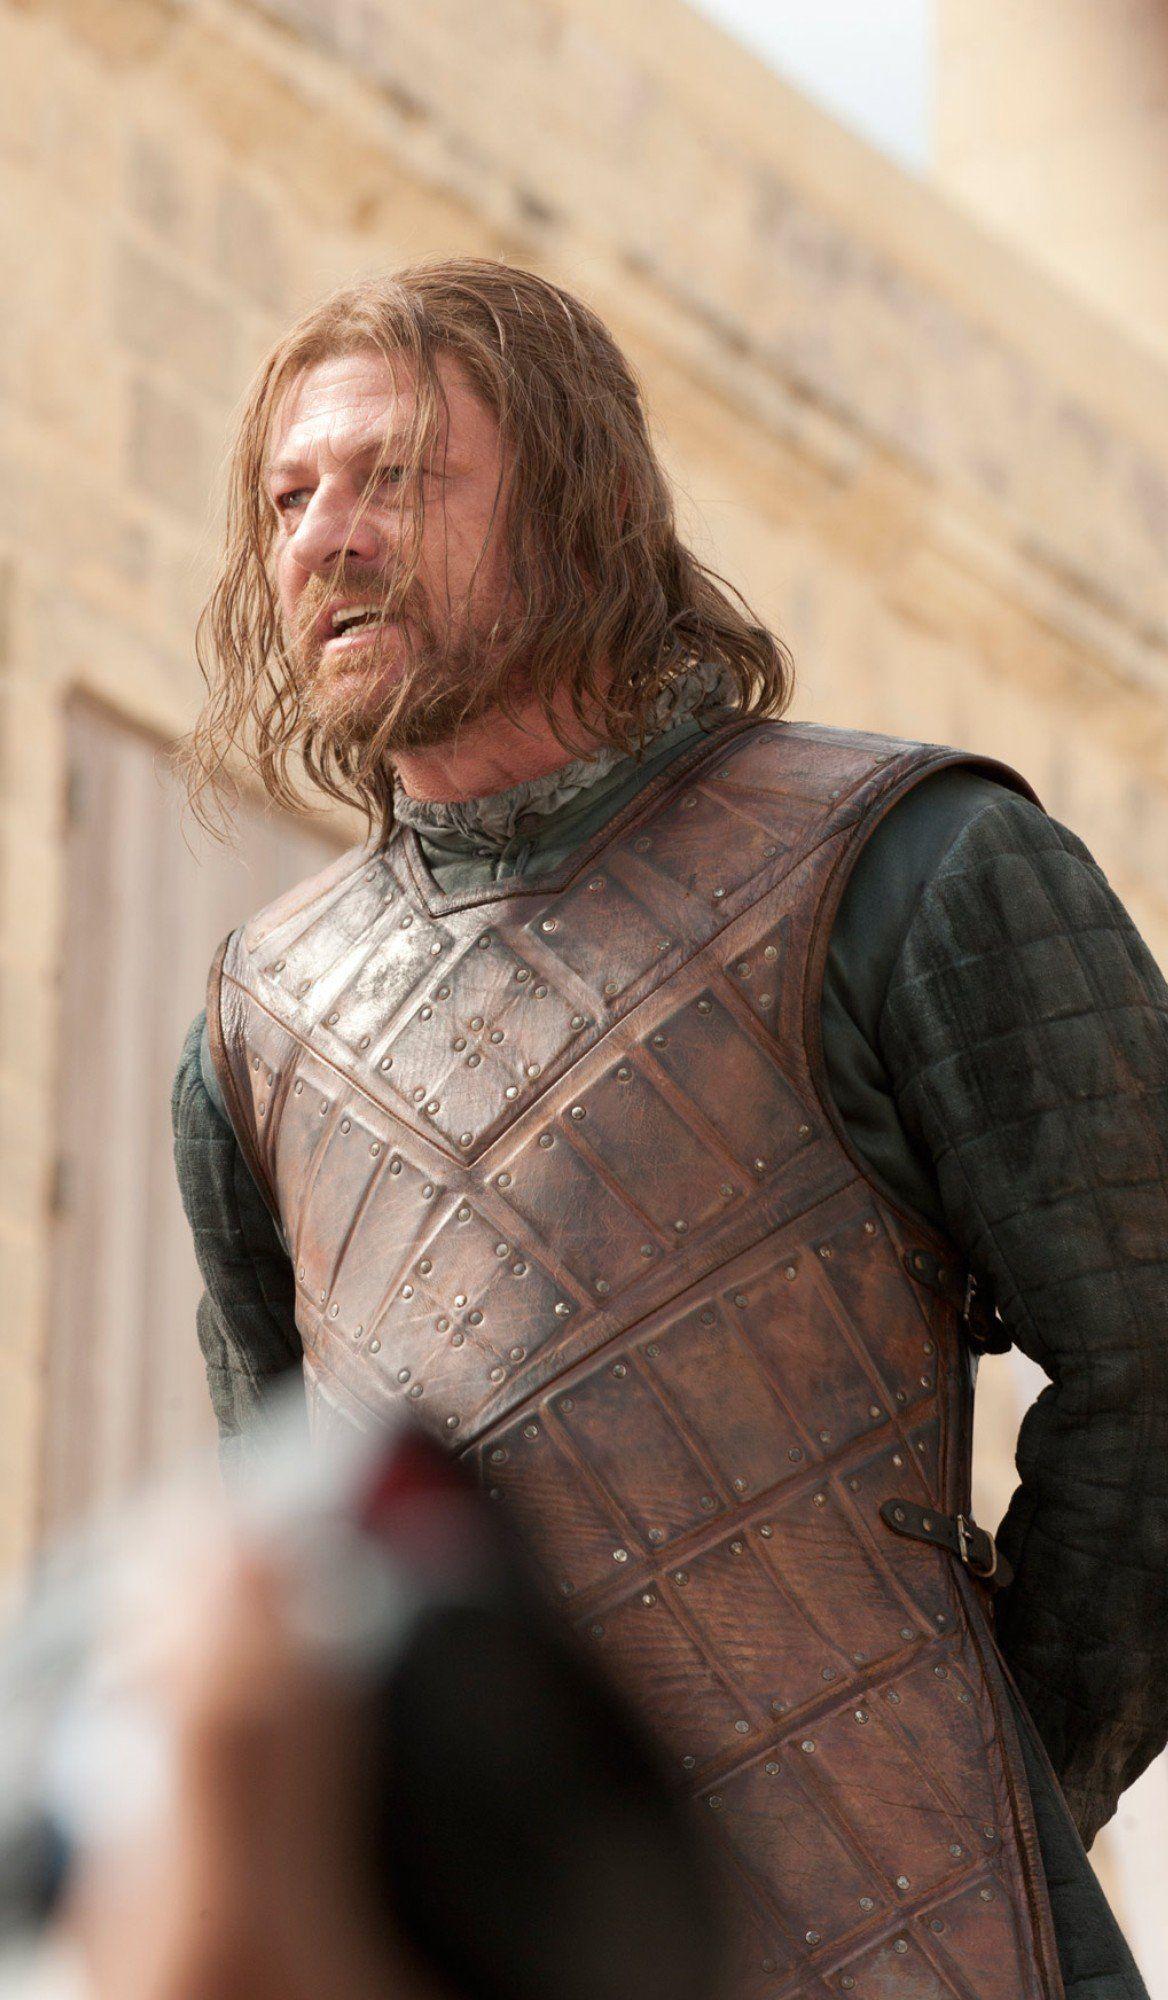 Game of Thrones - Season 1 Episode 9 Still